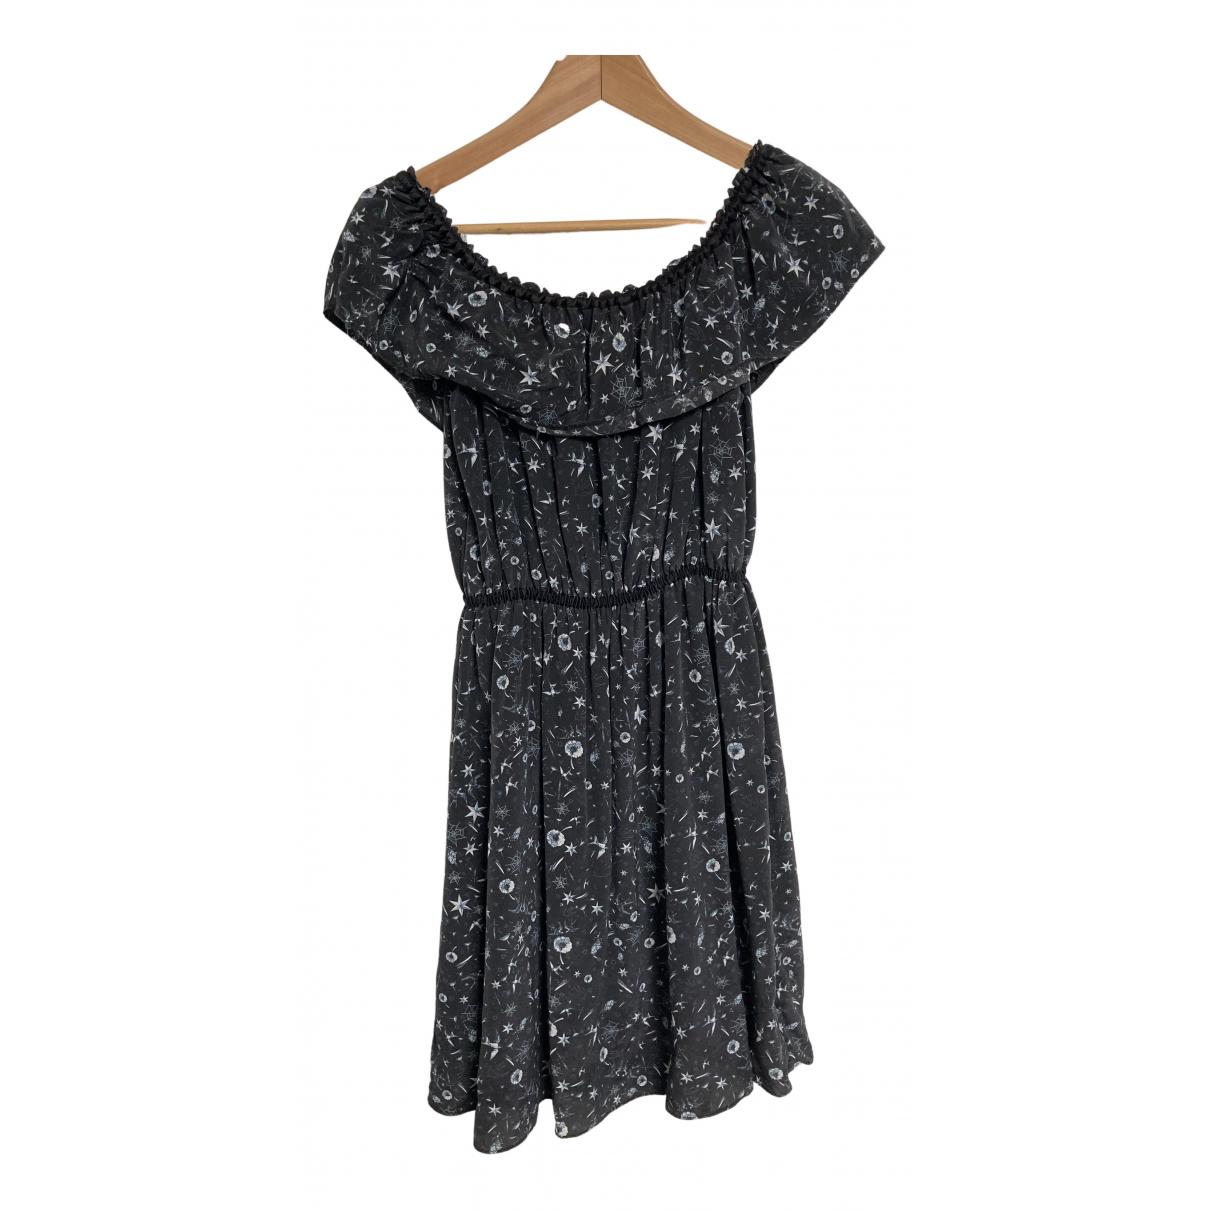 The Kooples \N Kleid in  Anthrazit Polyester